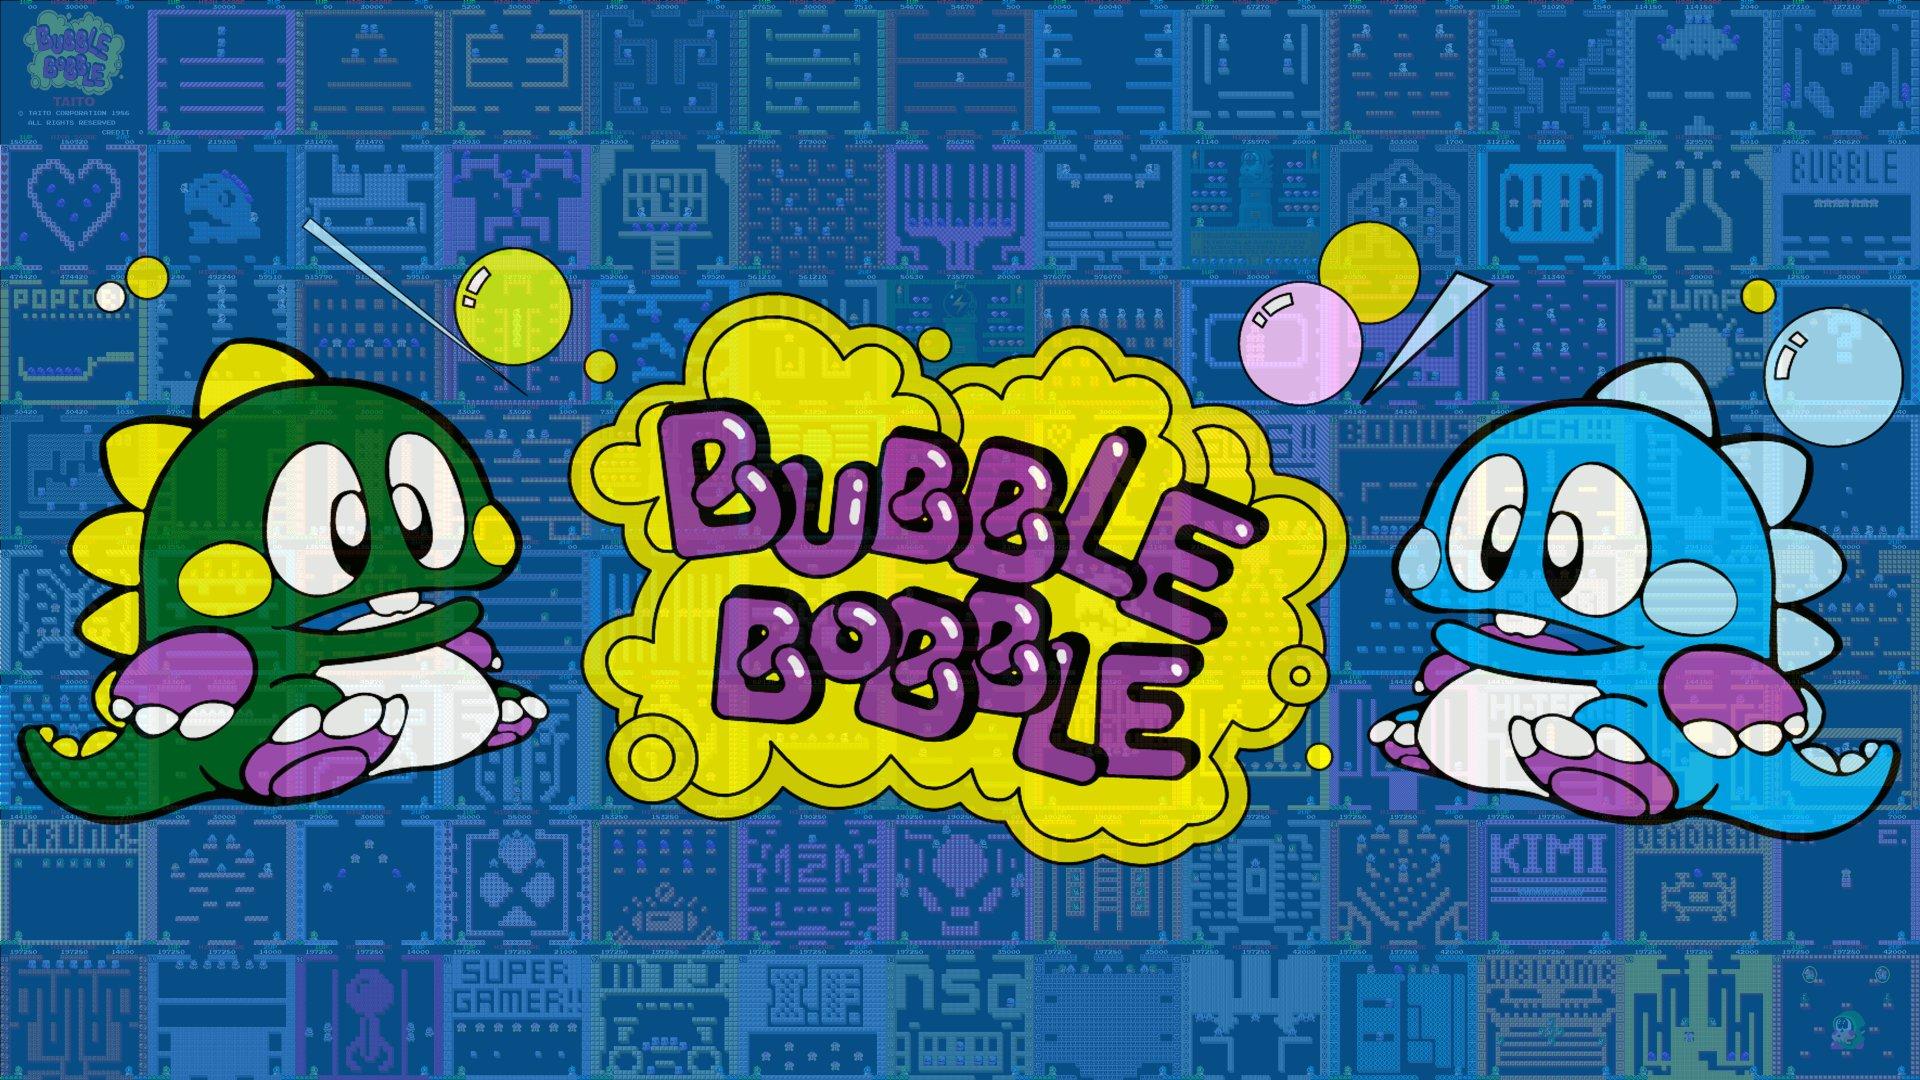 Retro Recap: Bubble Bobble - The Koalition